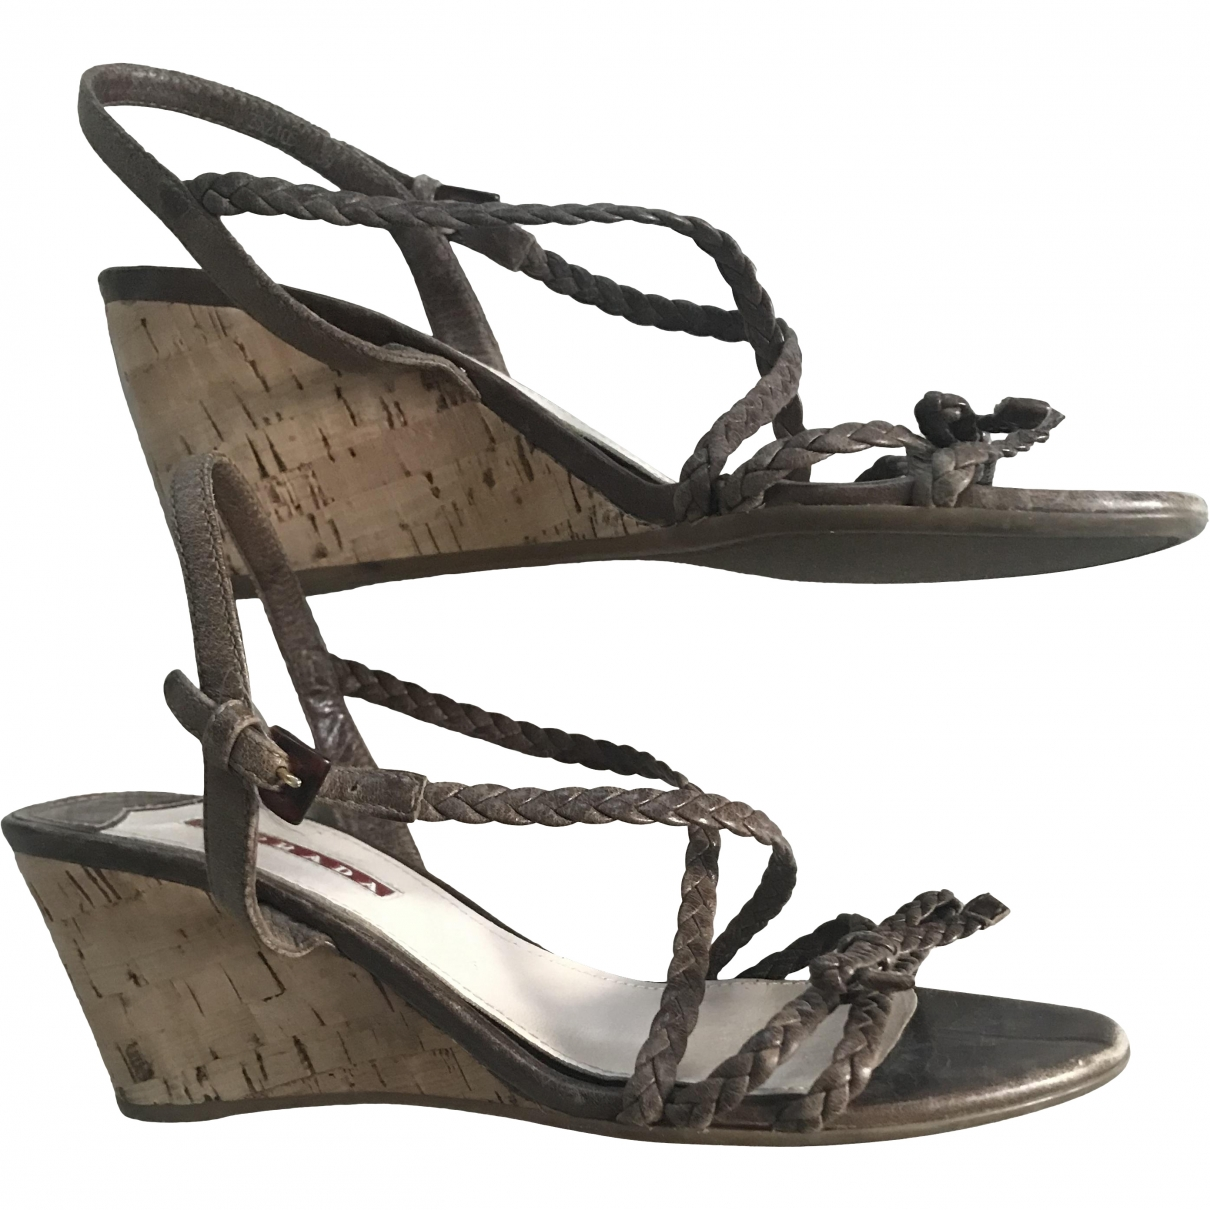 Prada \N Brown Leather Sandals for Women 39 EU